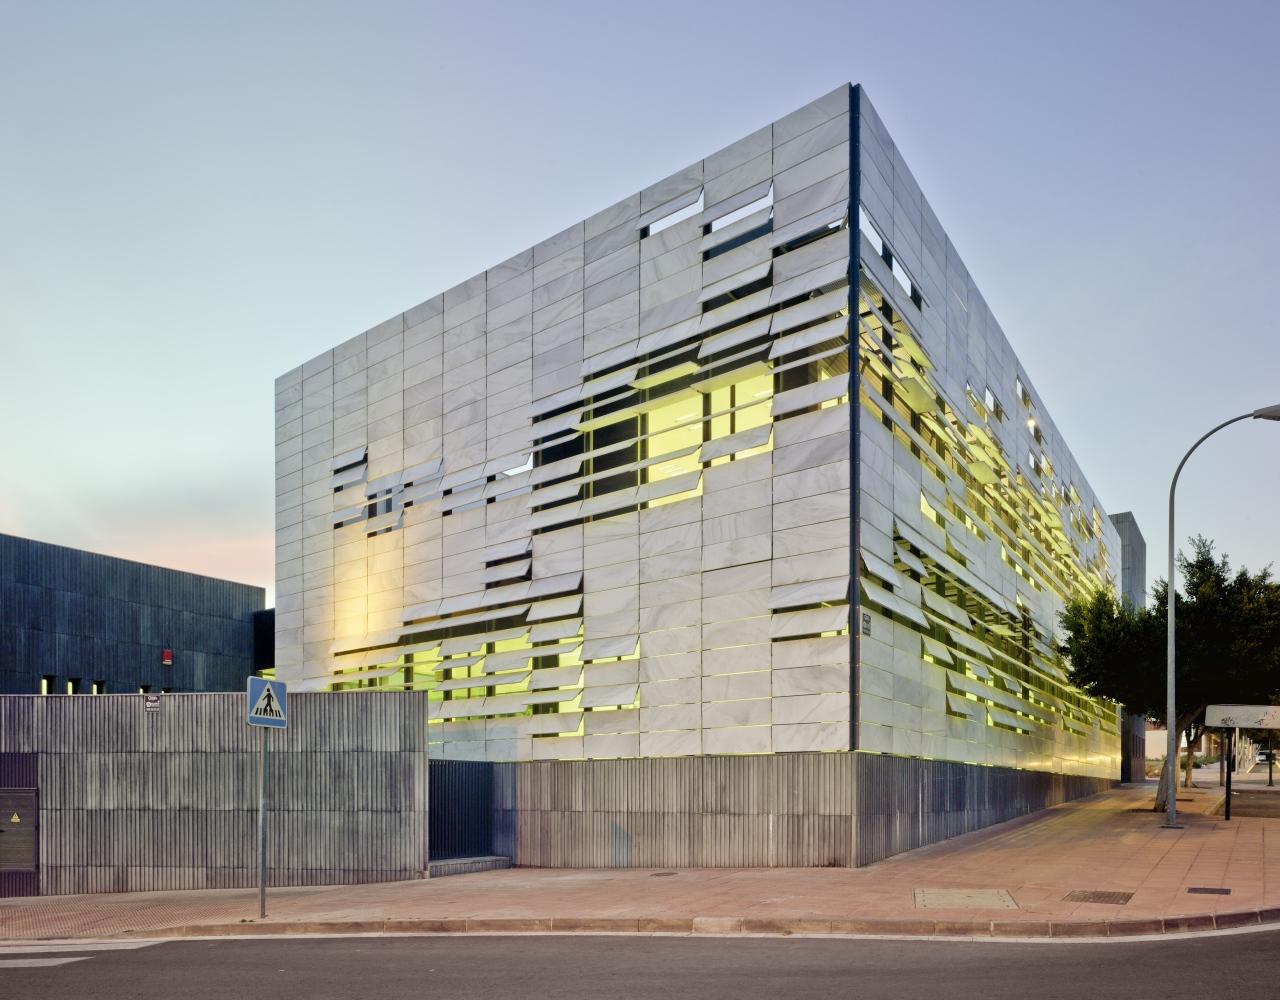 North Mediterranean Health Center / Ferrer Arquitectos, © David Frutos